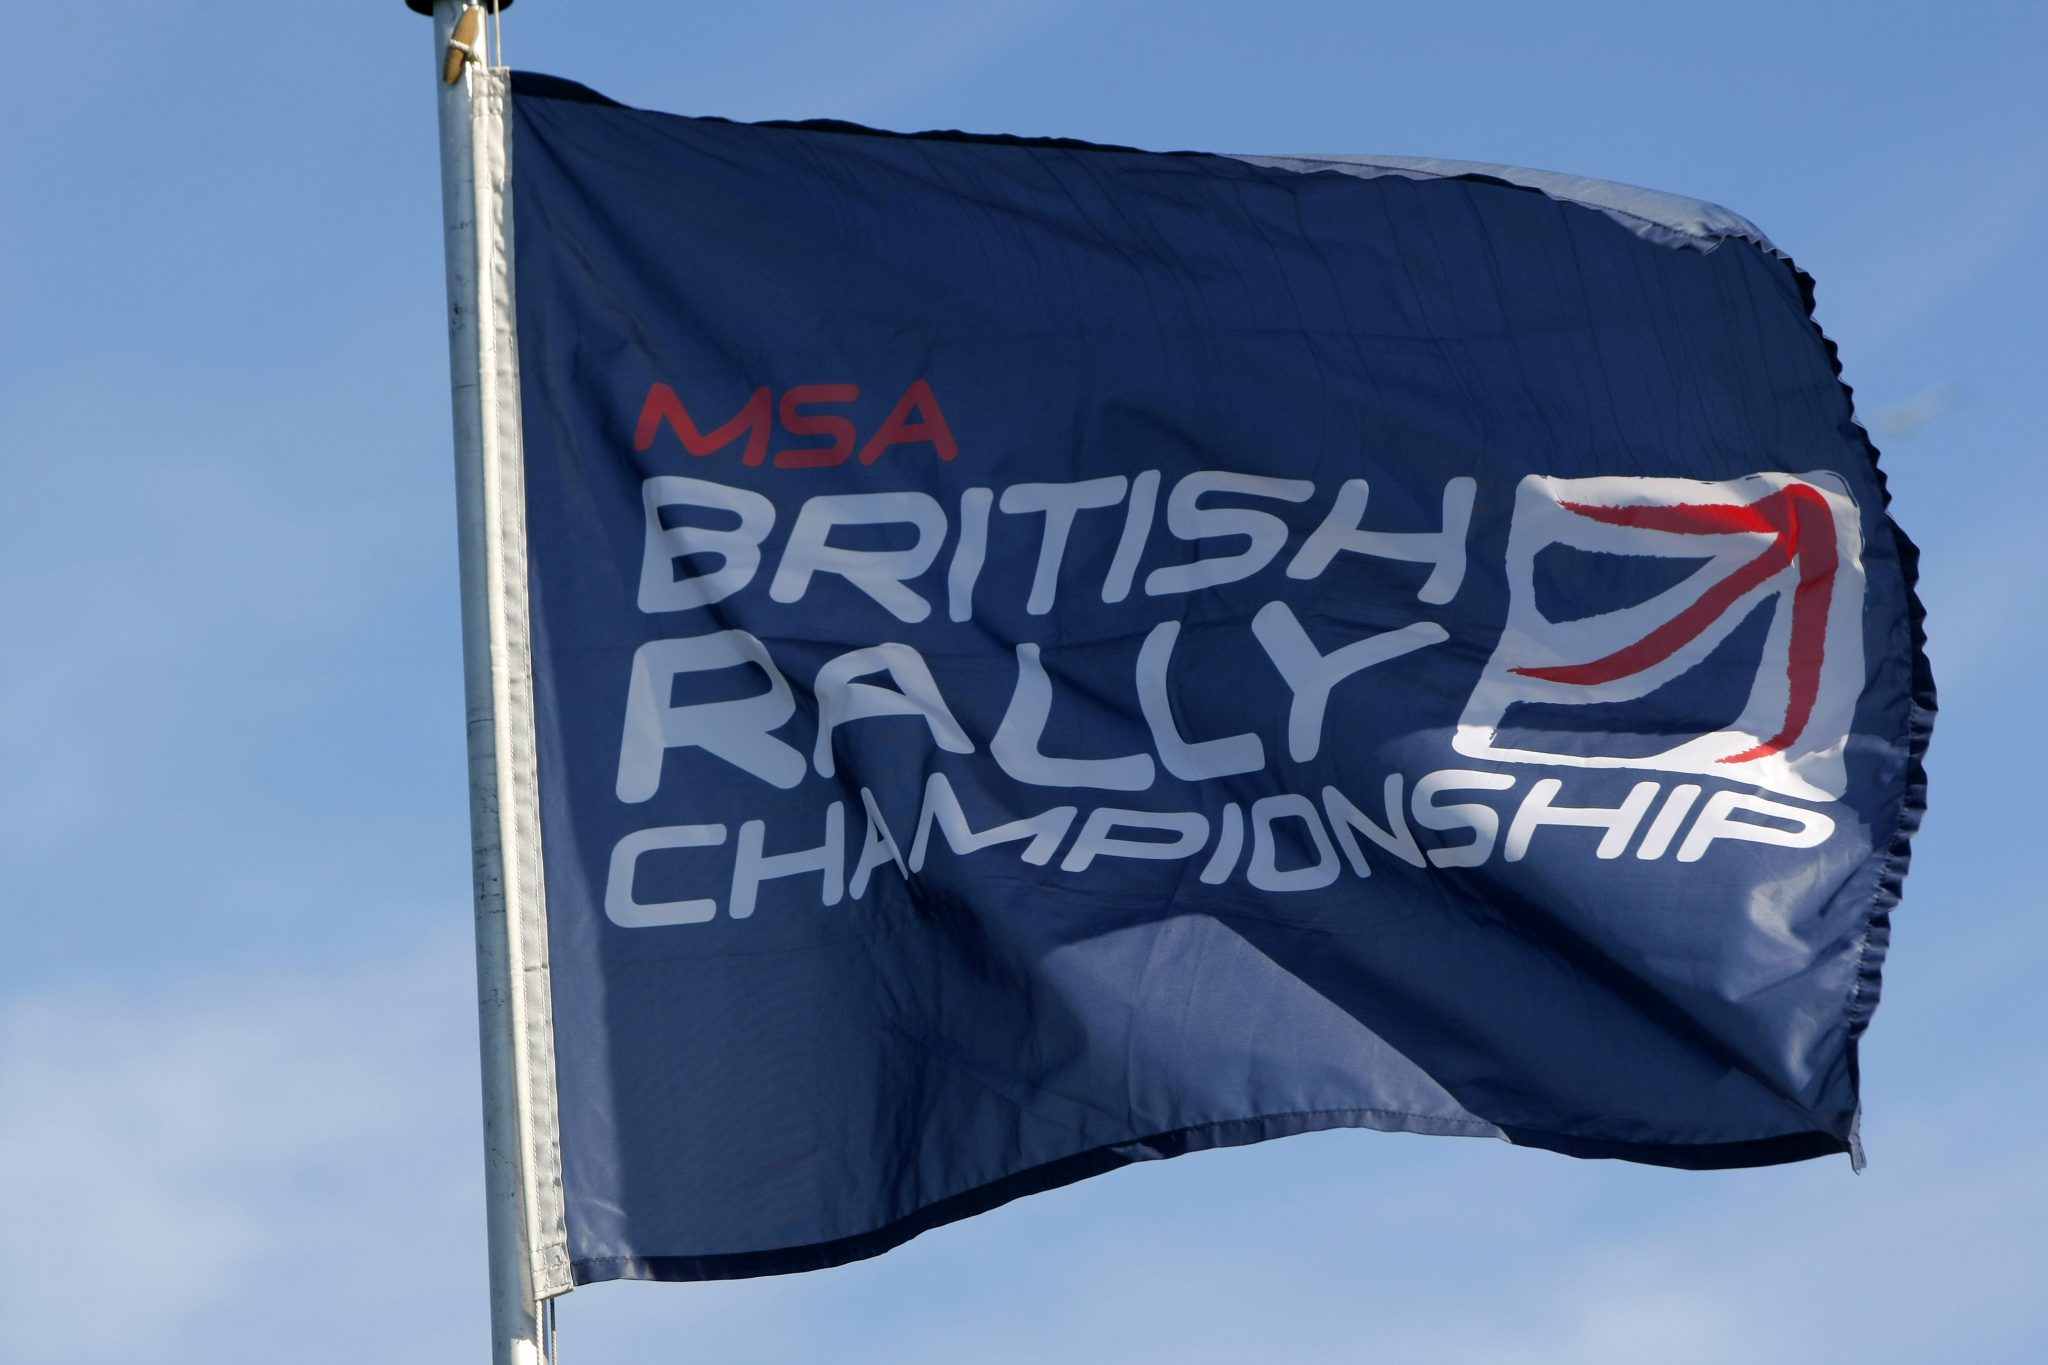 2999, 2999, British Rally Championship, BRC-07.jpg, 194332, https://surfturf.co.uk/wp-content/uploads/2018/06/BRC-07.jpg, https://surfturf.co.uk/case-studies/british-rally/attachment/british-rally-championship-8/, , 3, , British Rally Championship, british-rally-championship-8, inherit, 849, 2018-11-28 14:22:29, 2018-11-28 14:22:29, 0, image/jpeg, image, jpeg, https://surfturf.co.uk/wp-includes/images/media/default.png, 2048, 1365, Array